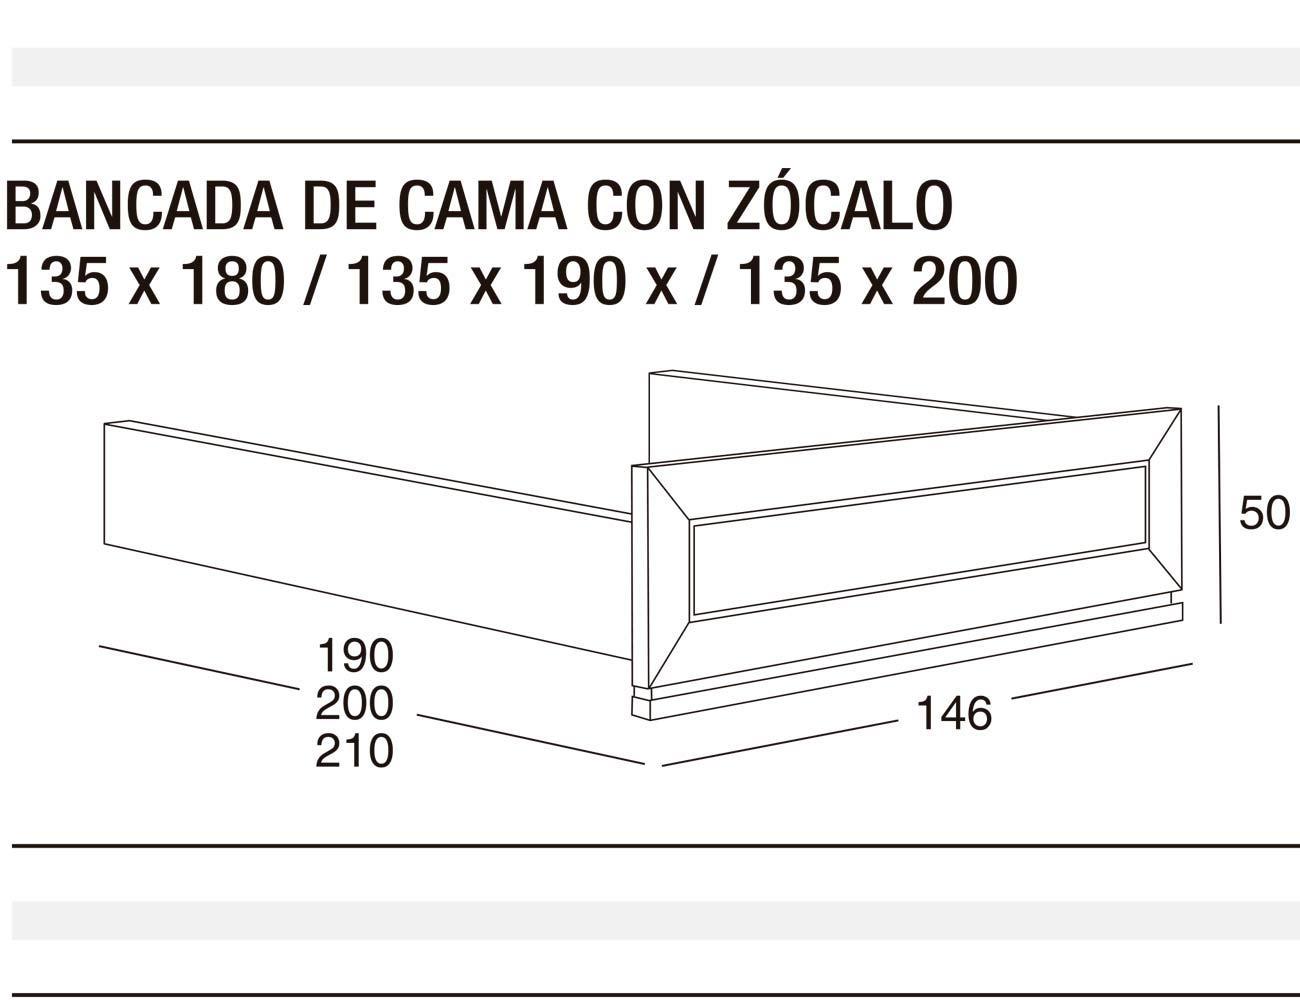 Bancada cama z 135x180 135x190 135x2003